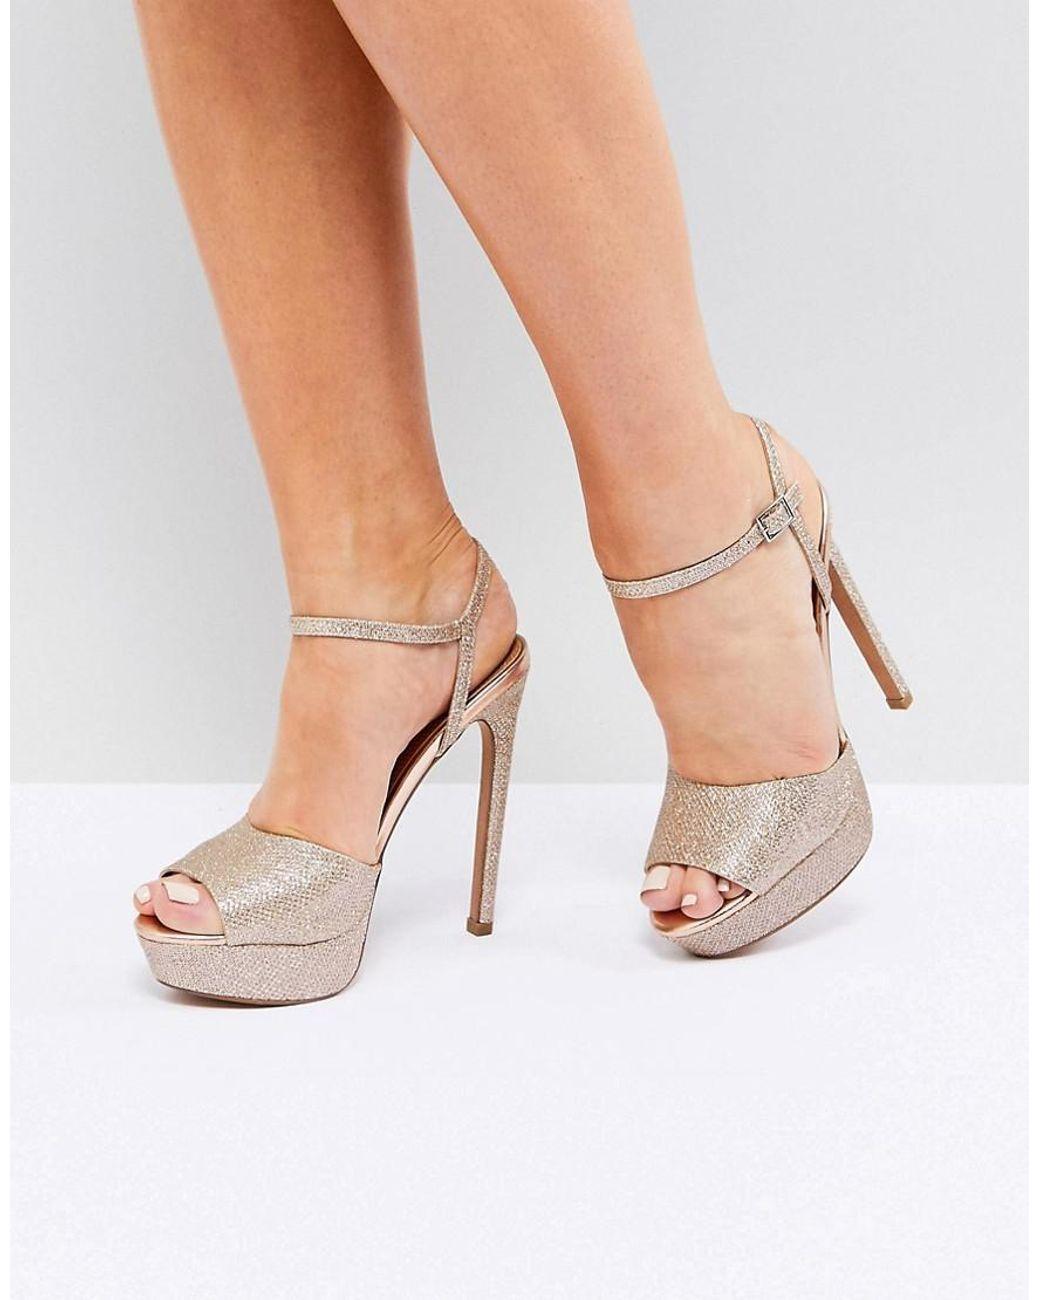 d7328277807 Women's Metallic Asos Hotel Platform Heeled Sandals